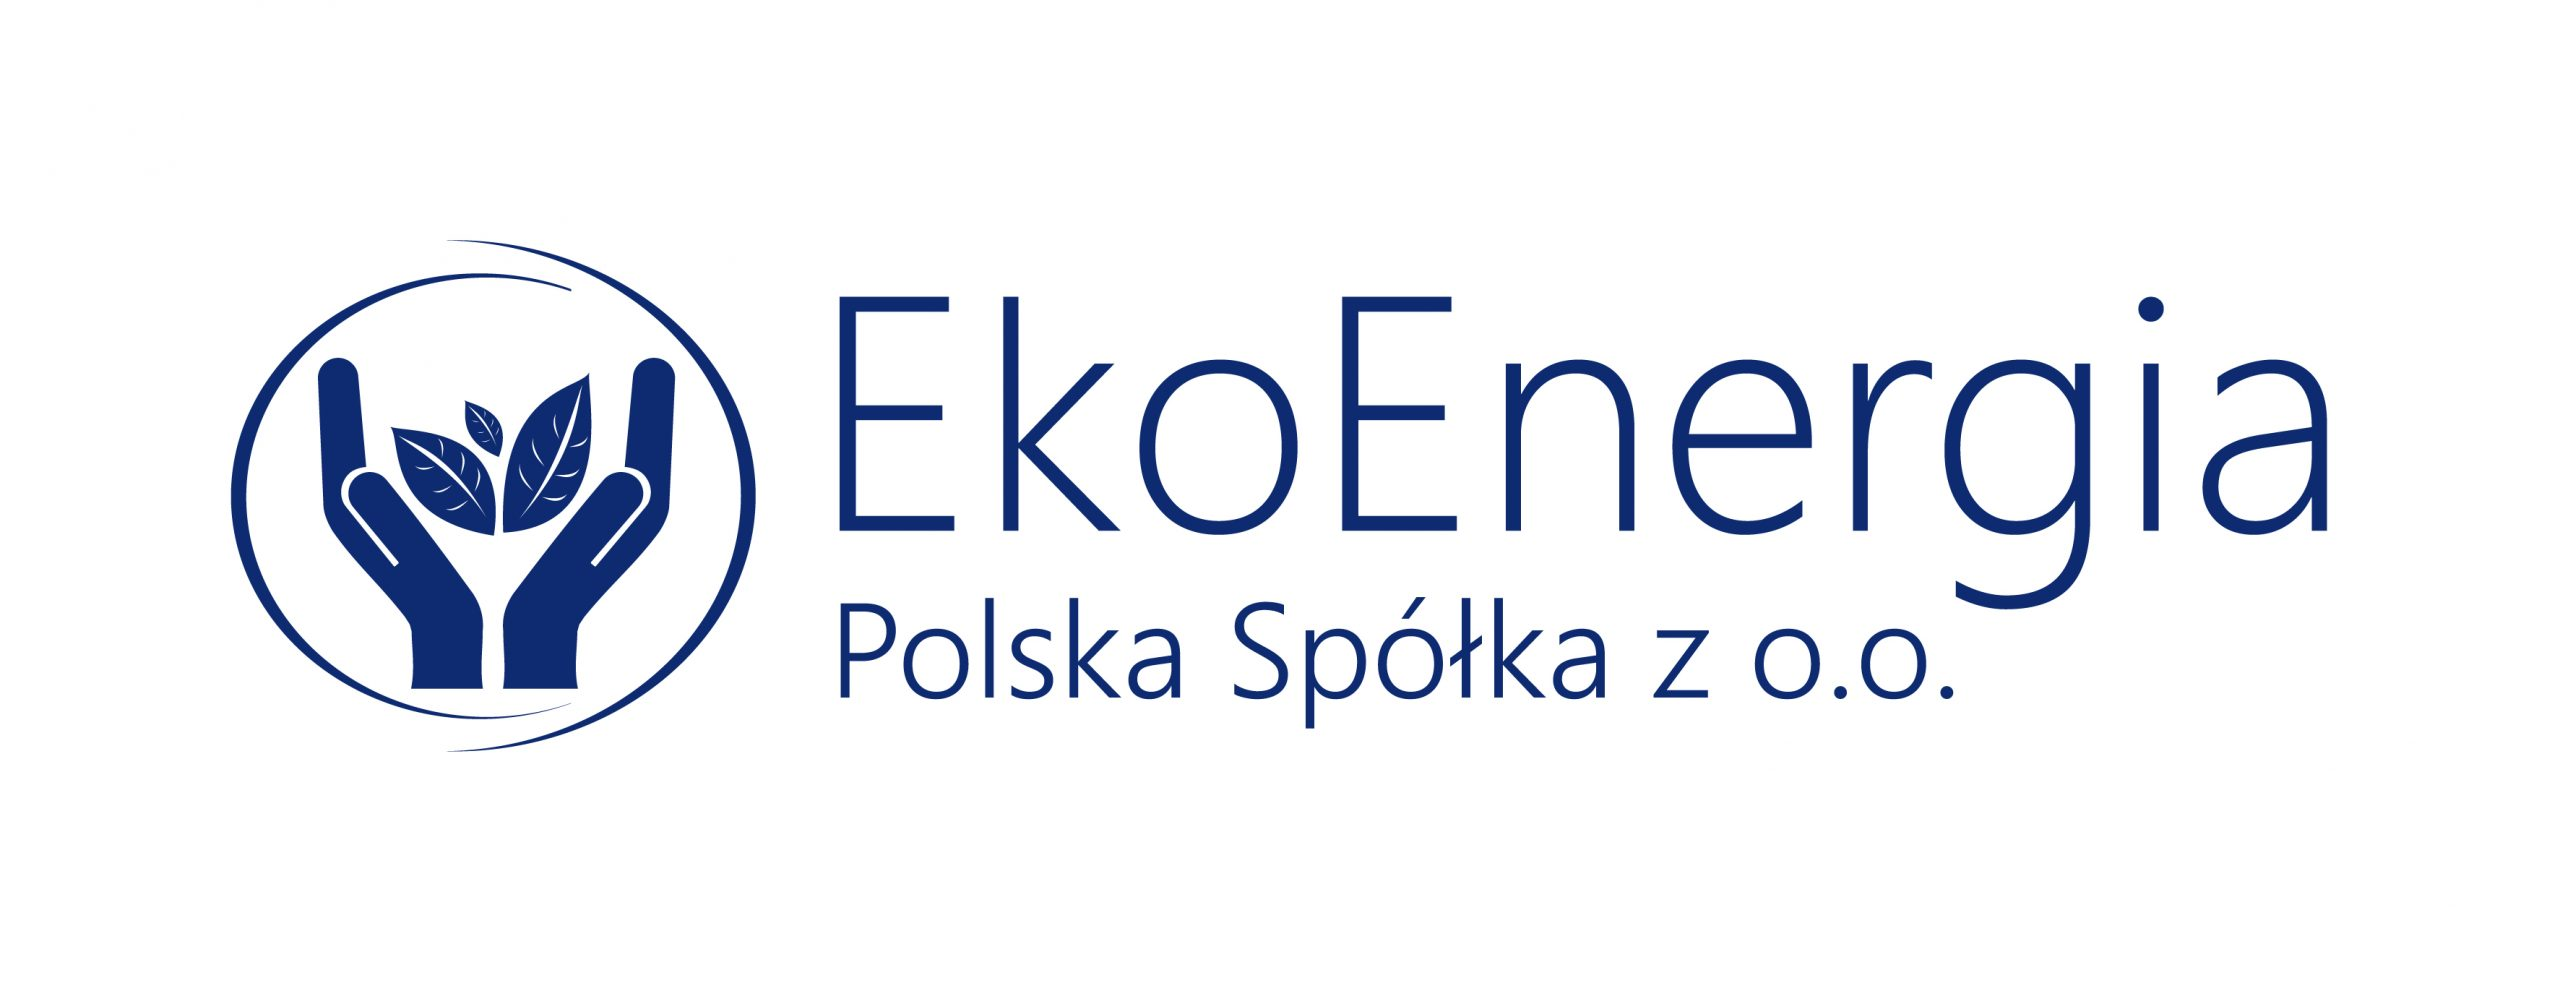 EkoEnergia Polska